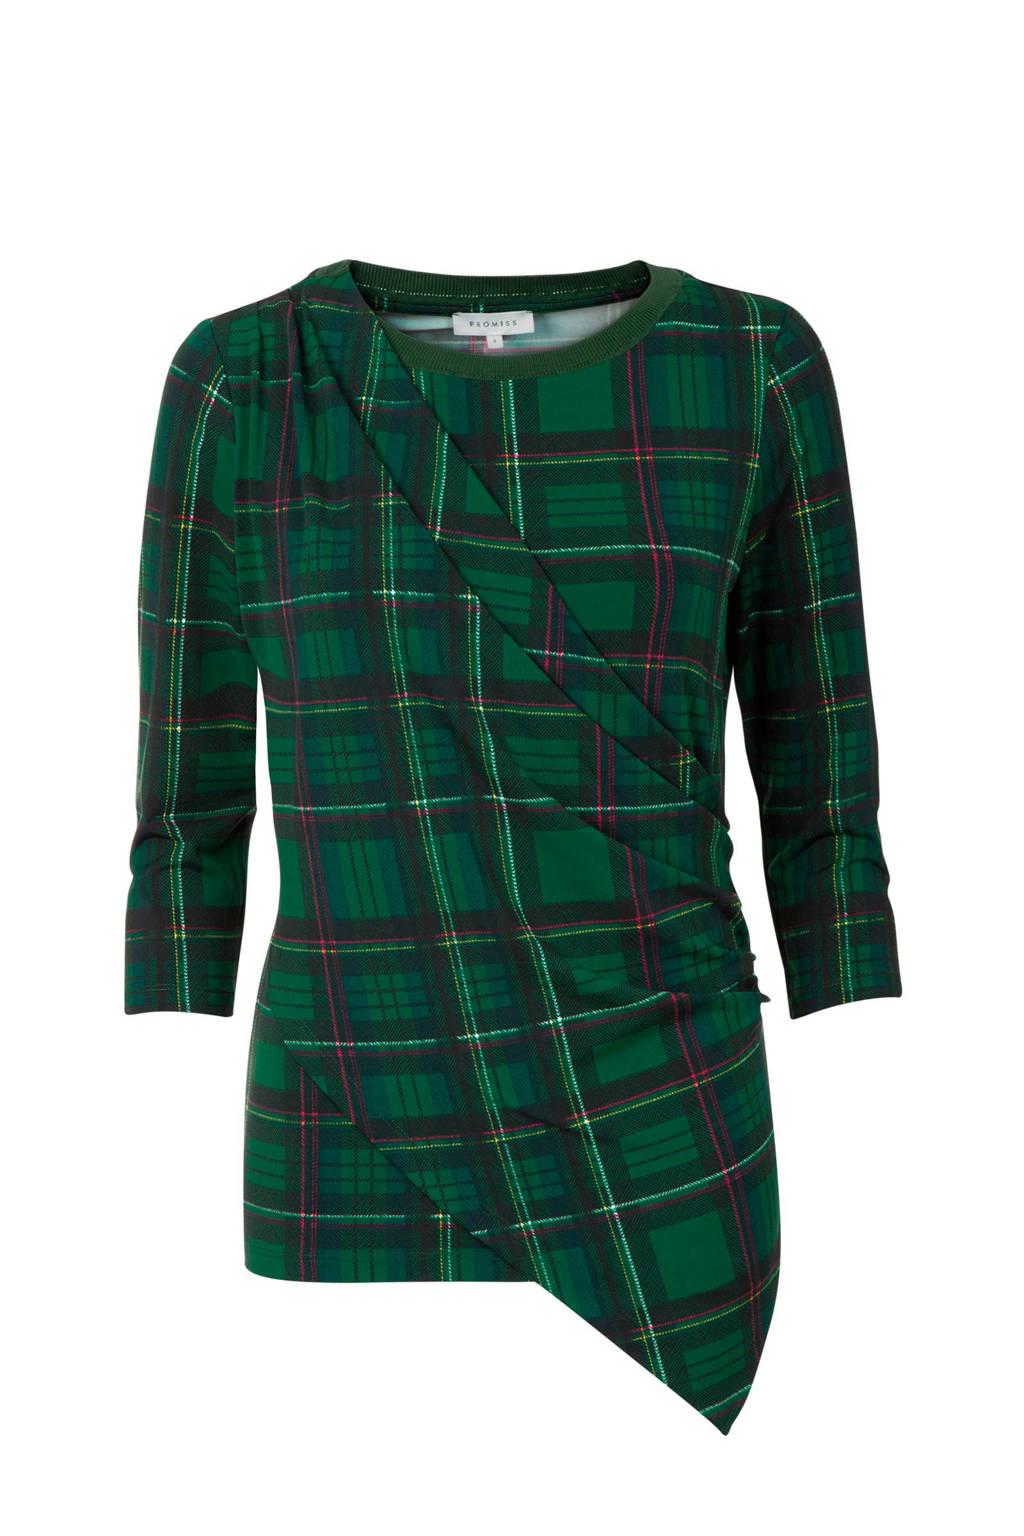 Promiss T-shirt met all over ruit print groen, Groen/Wit/Rood